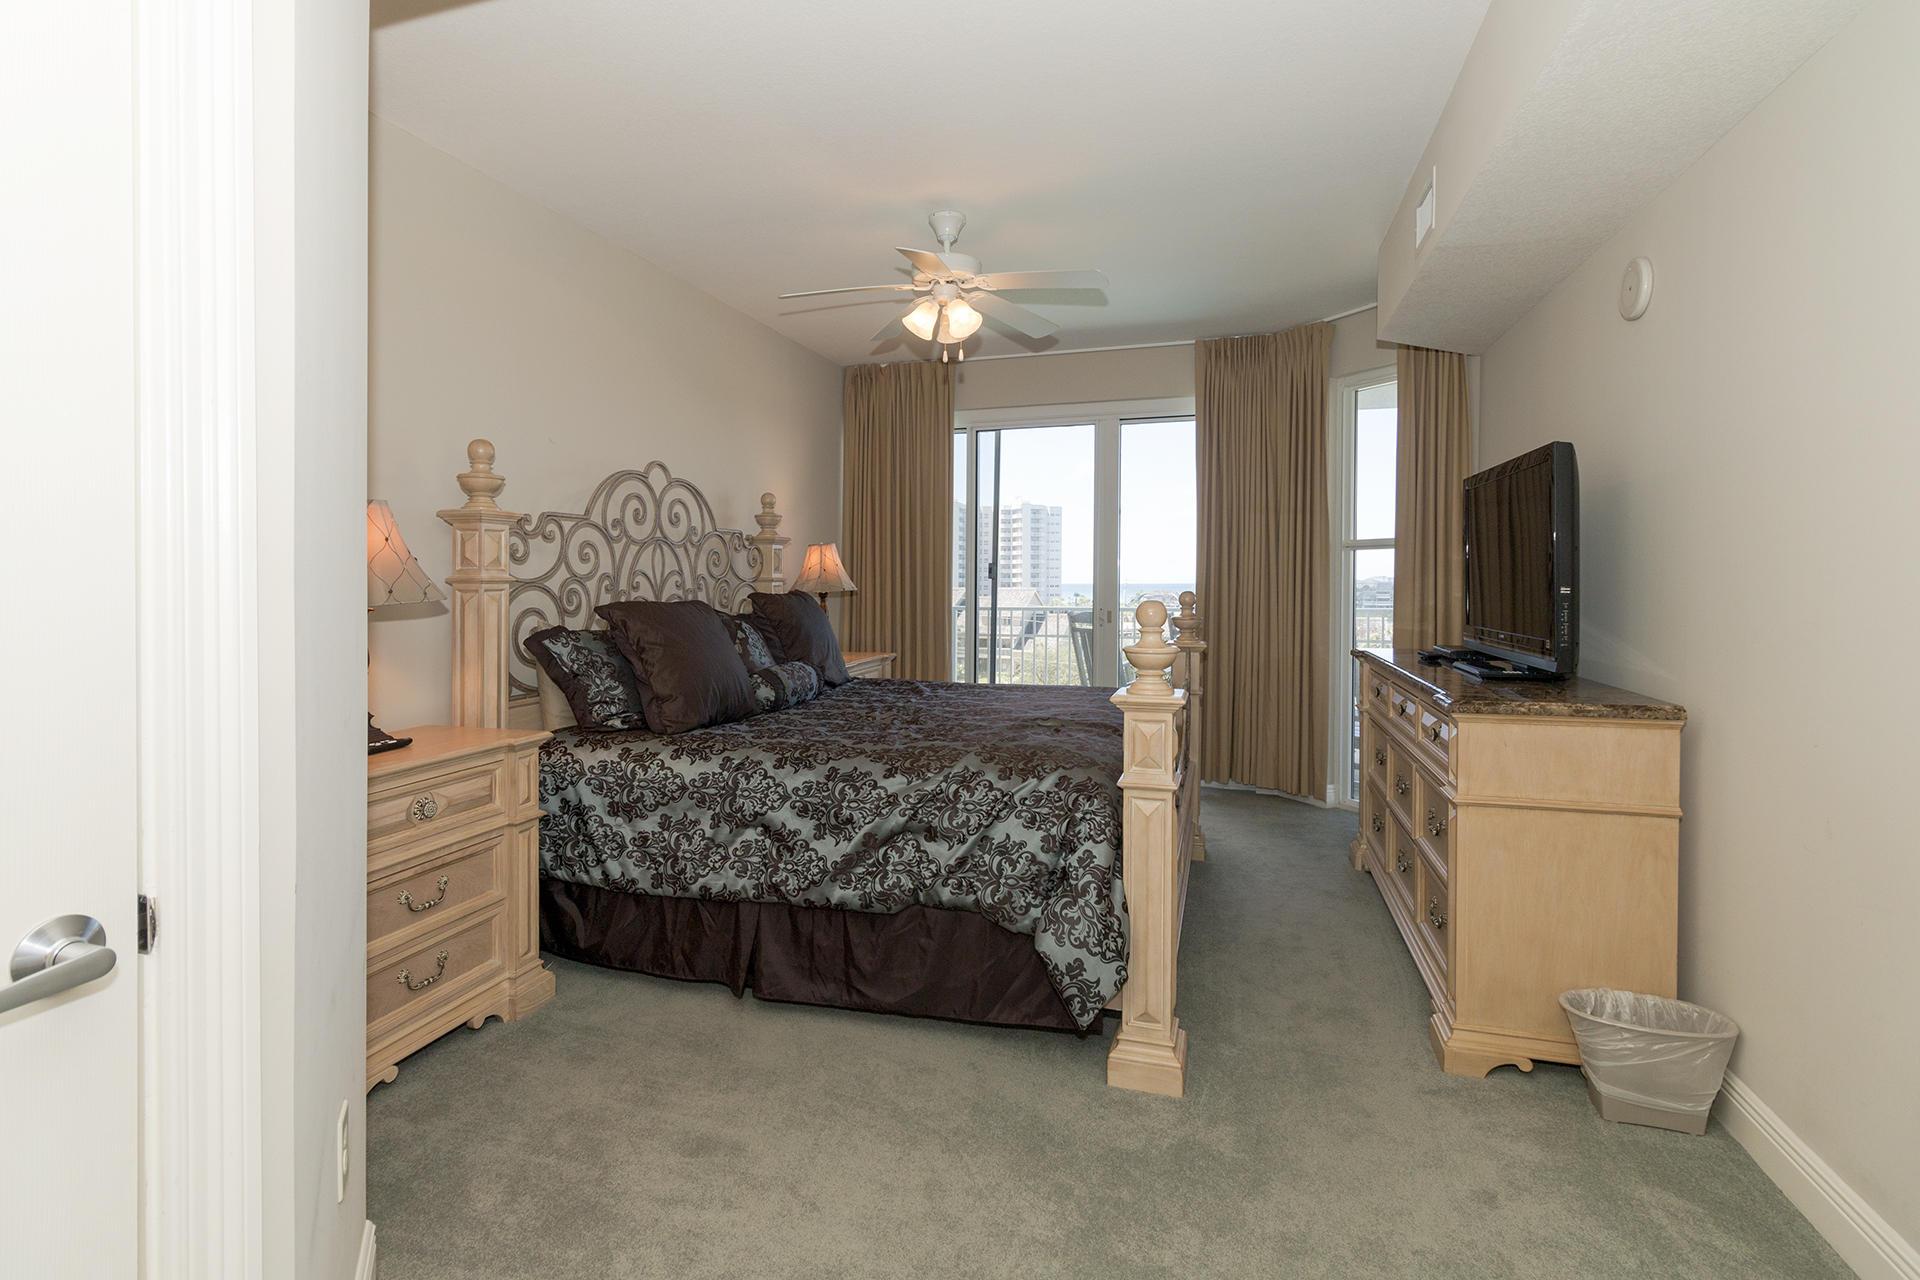 122 Seascape Drive - $440000